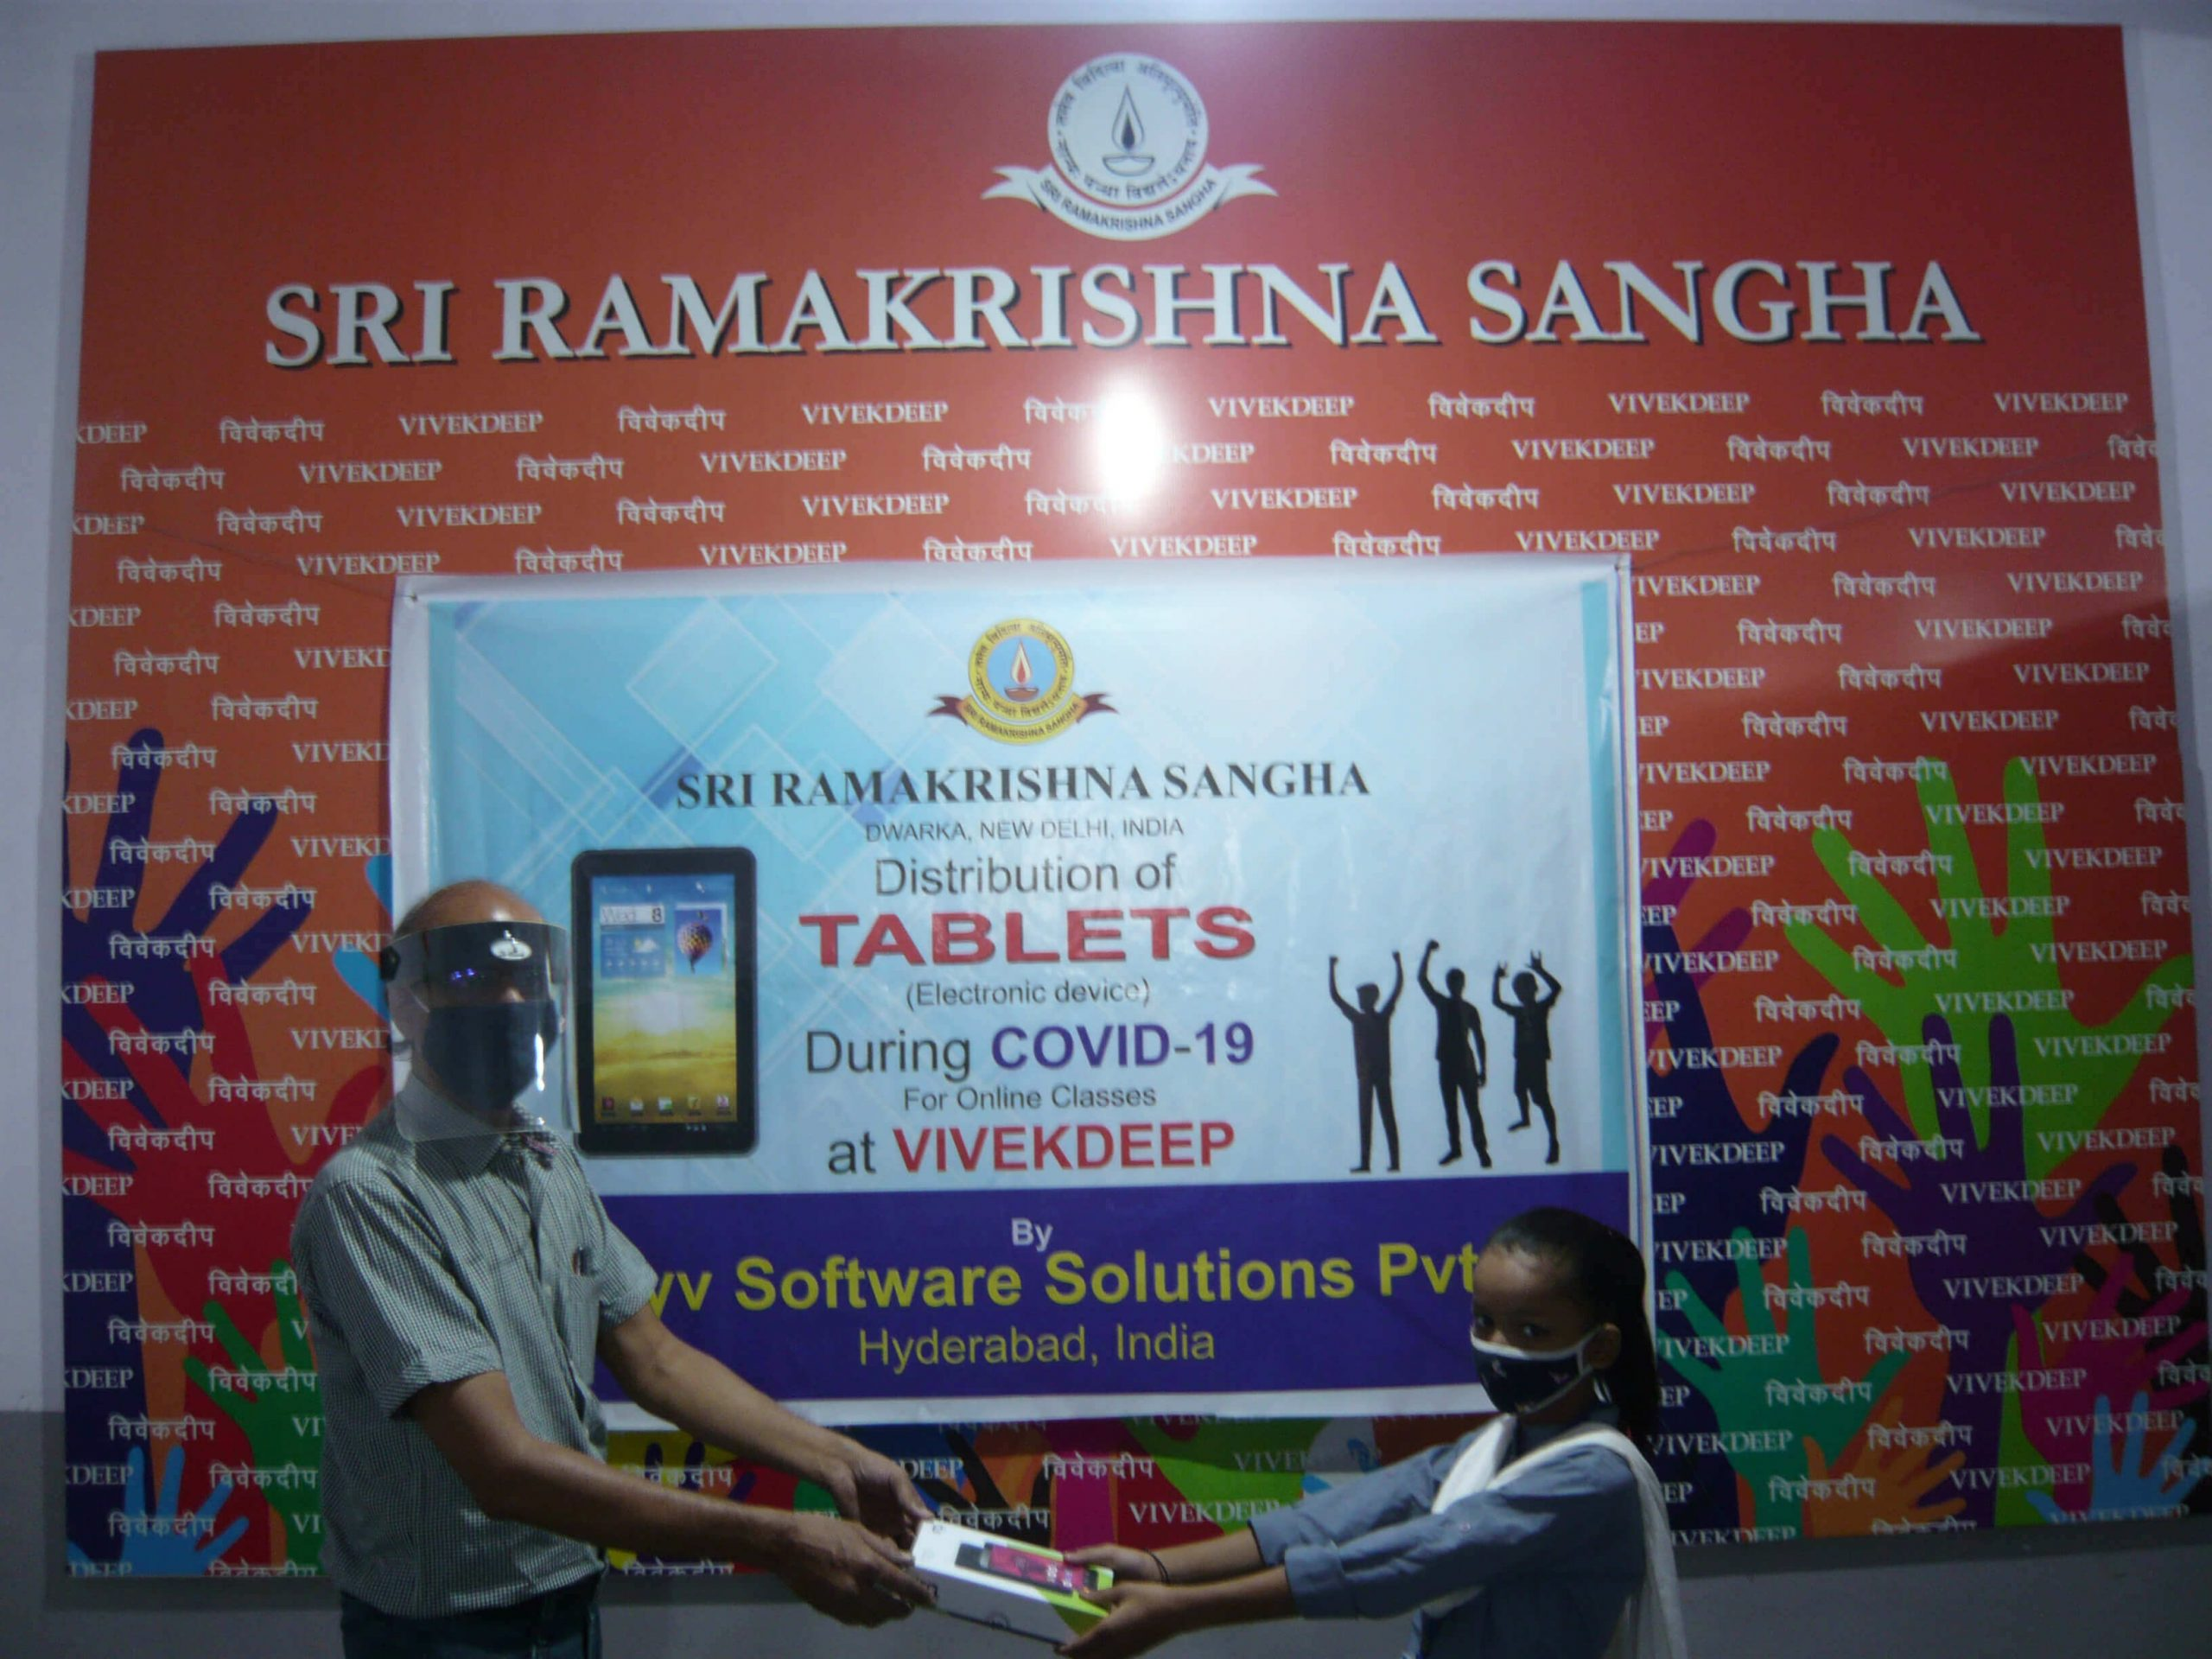 Vivekdeep, Sri Ramakrishna Sangha